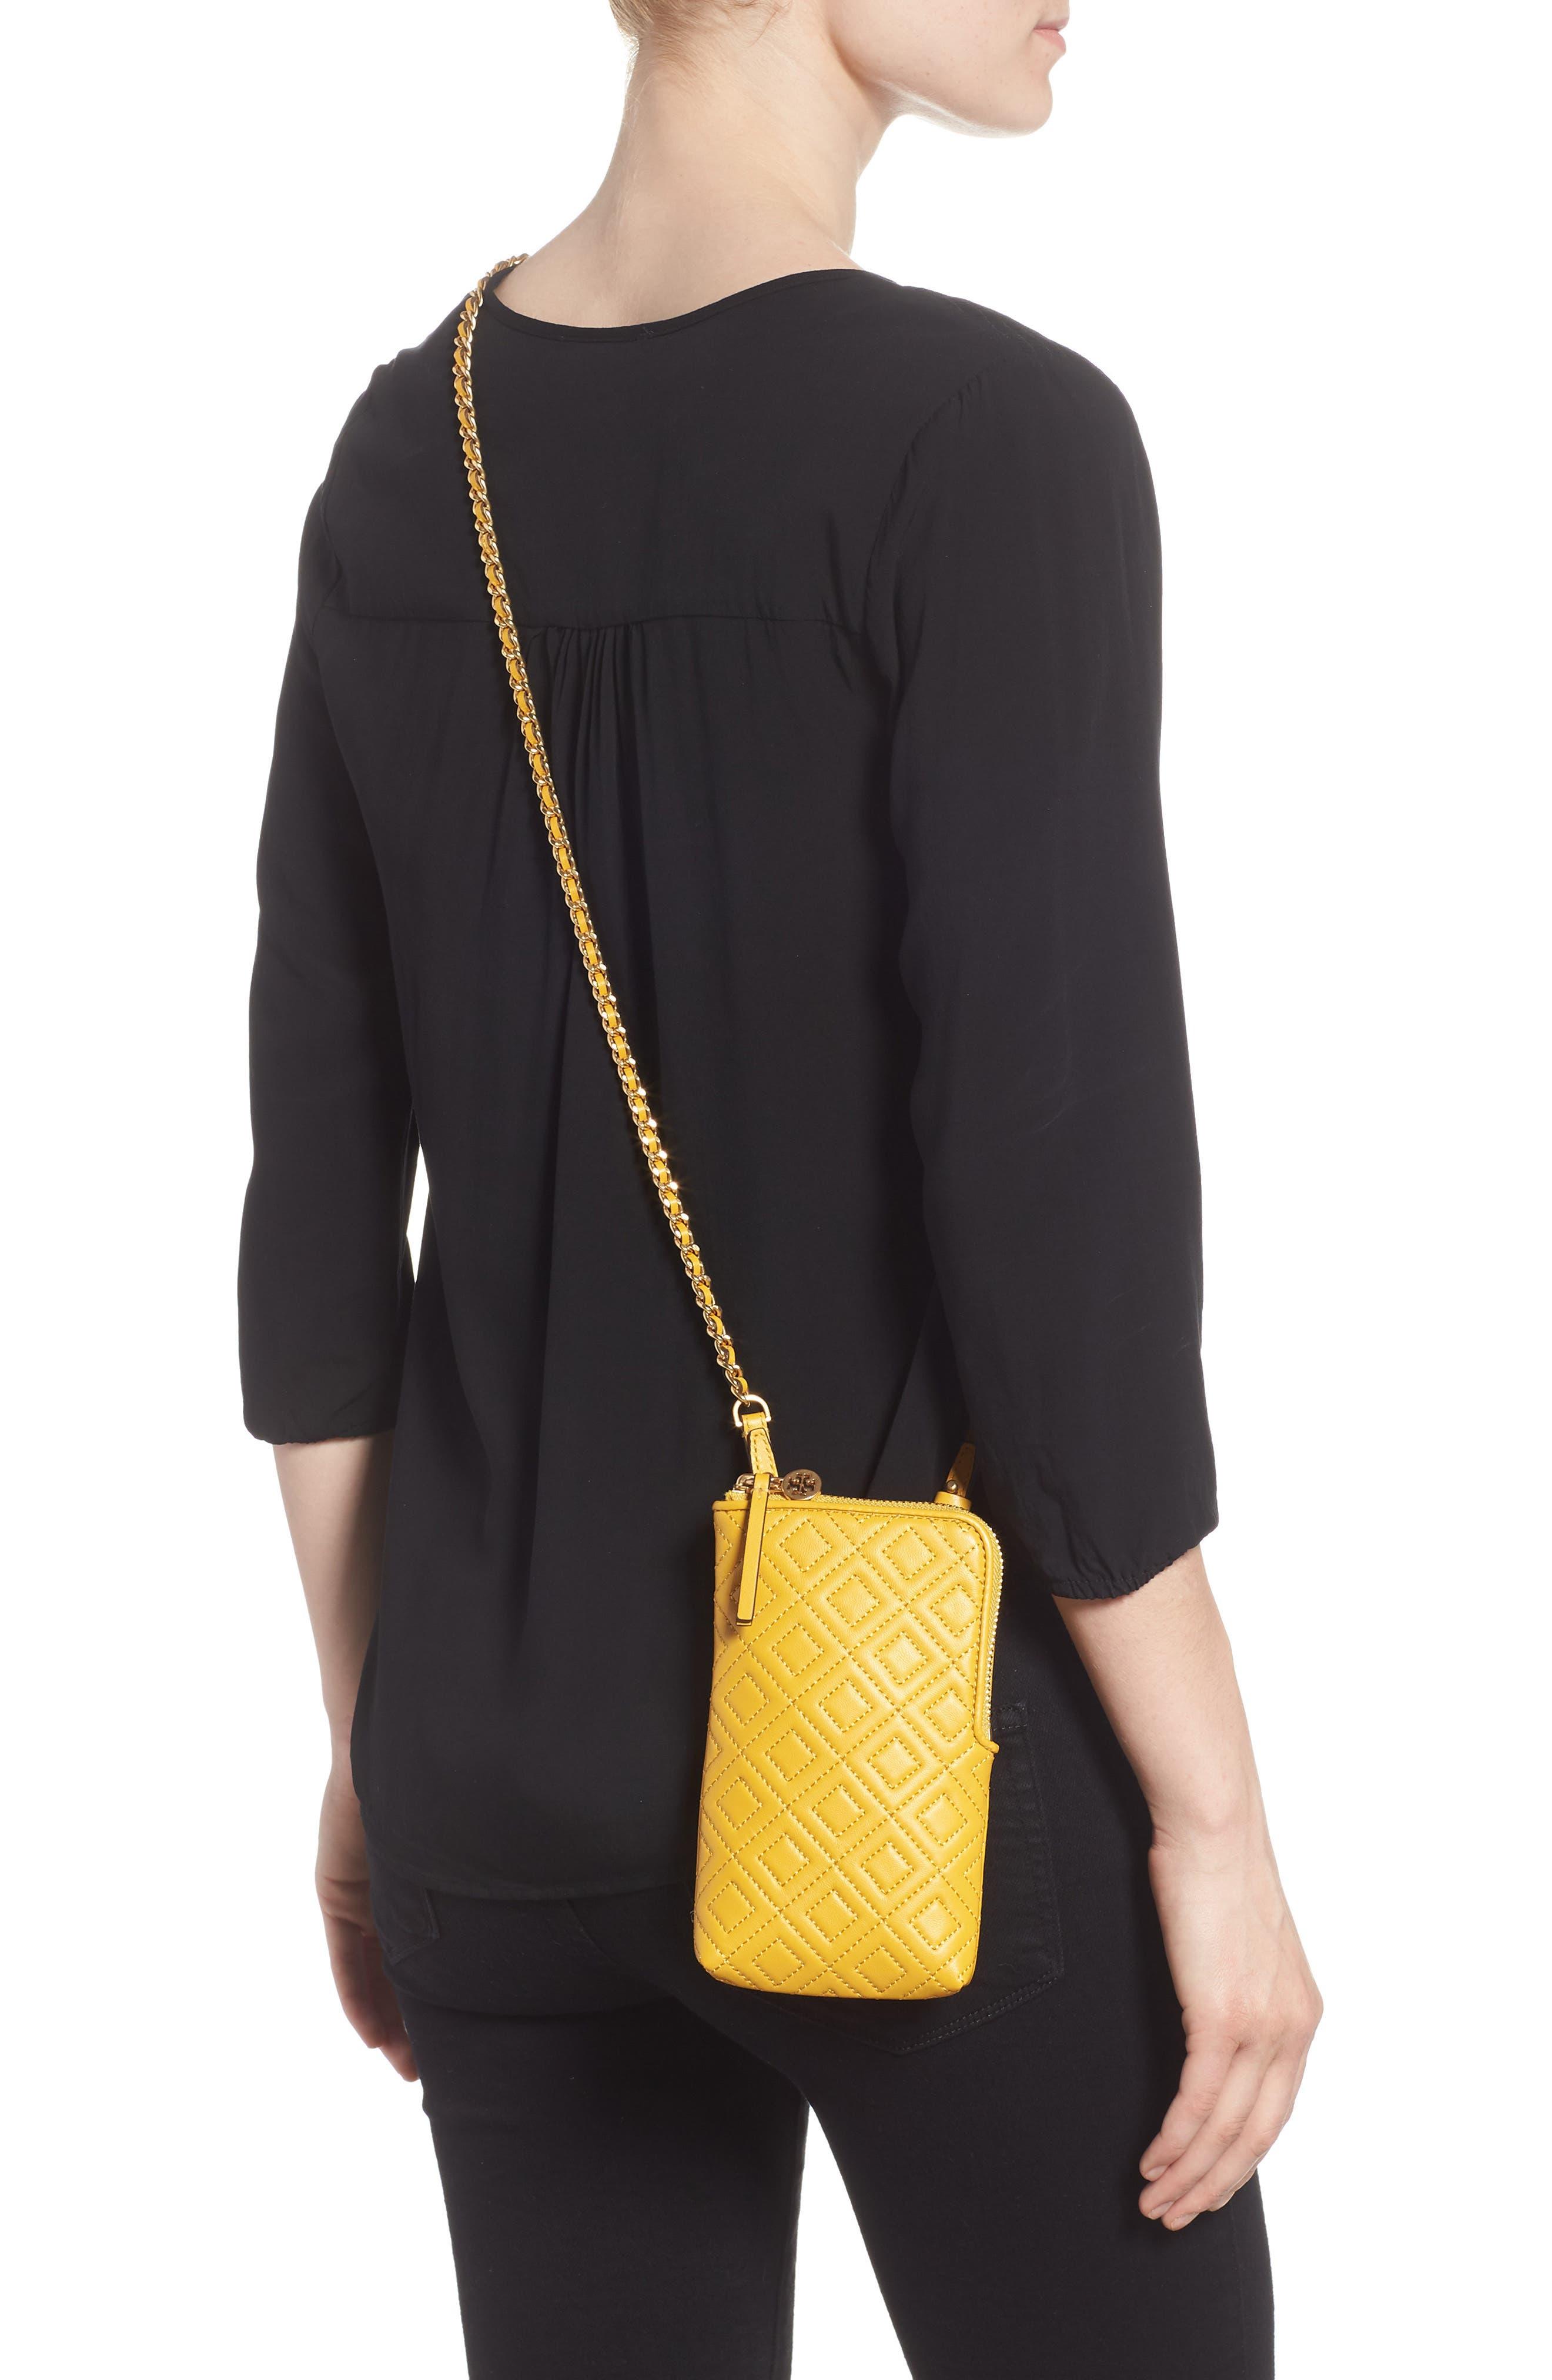 Fleming Lambskin Leather Phone Crossbody Bag,                             Alternate thumbnail 2, color,                             Daylily